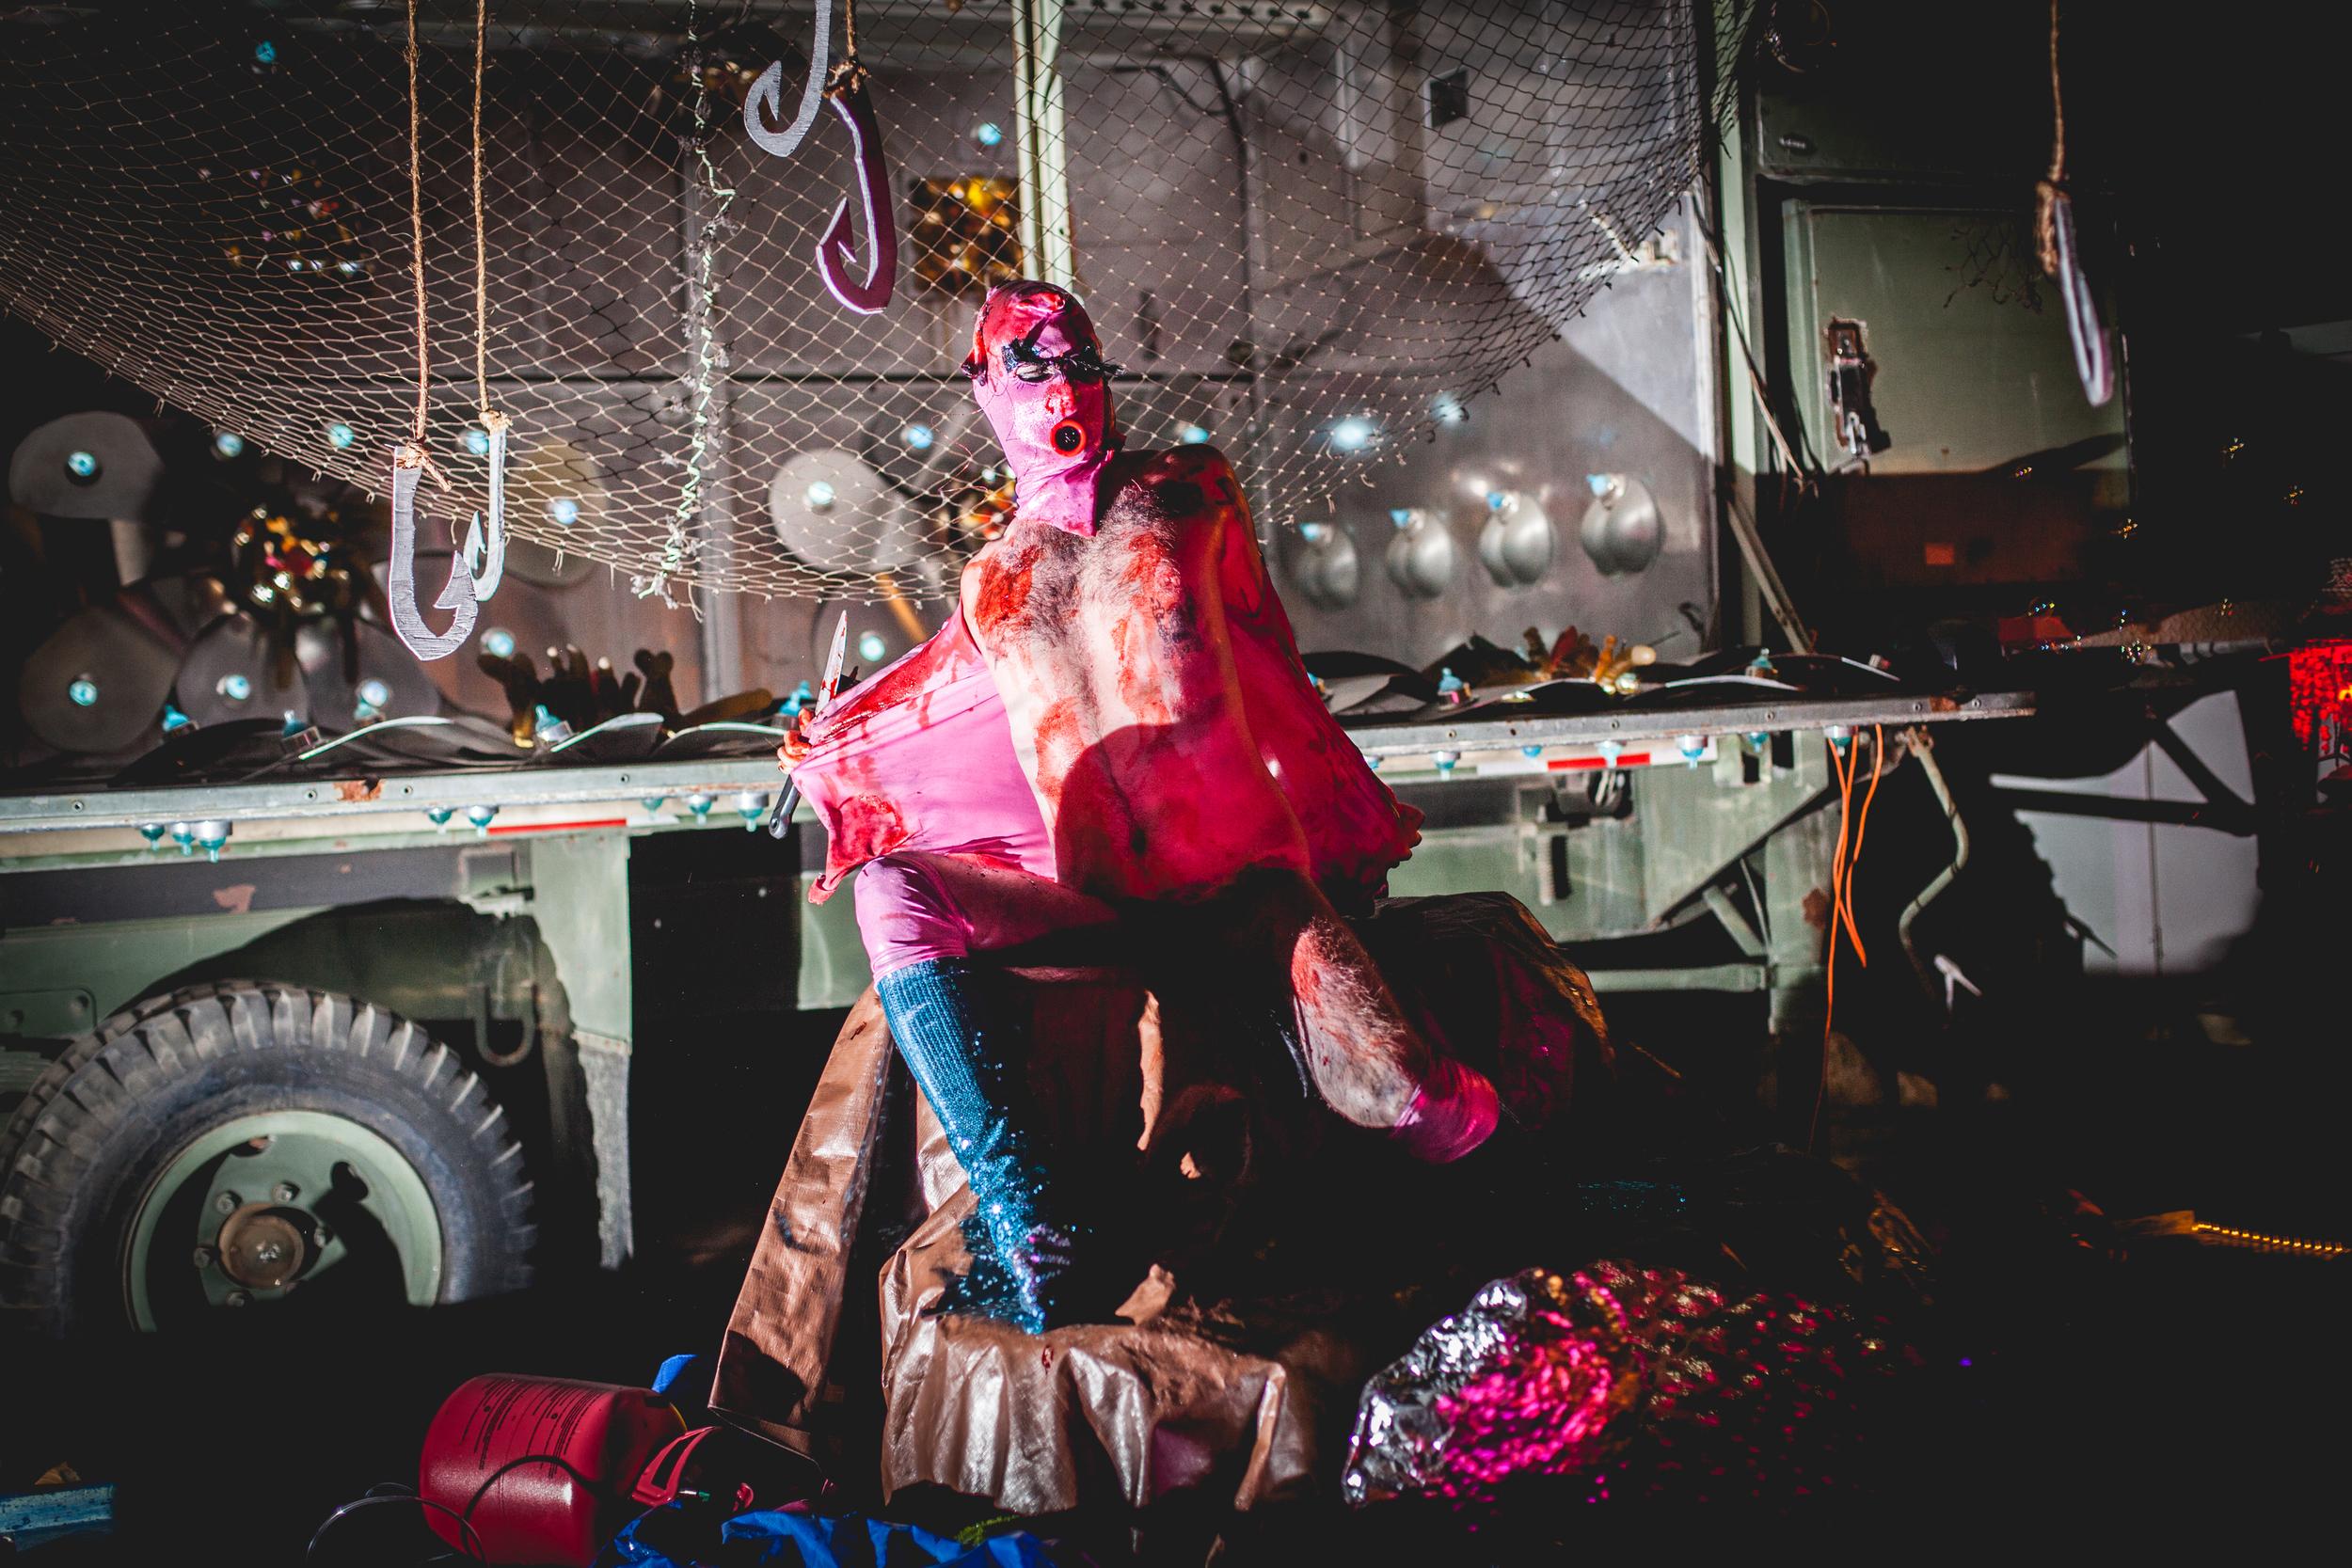 AARON SHEPPARD, 2015 Performance: Like, Out of Water, Joshua Tree, California. Photo by Krystal Ramirez